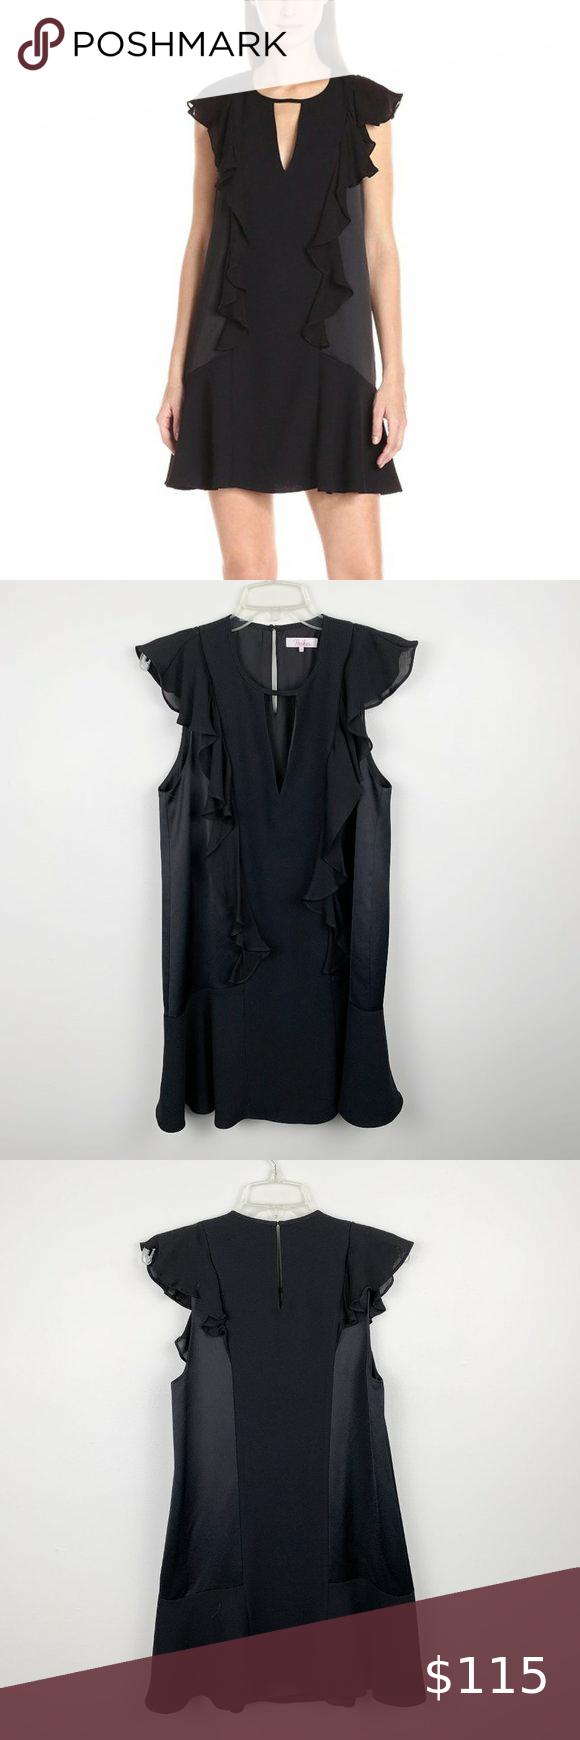 Nwot Parket Toni Black Ruffle Dress Xs Perfect Little Black Dress With Ruffle Details Going Down The Black Ruffle Dress Perfect Little Black Dress Ruffle Dress [ 1740 x 580 Pixel ]